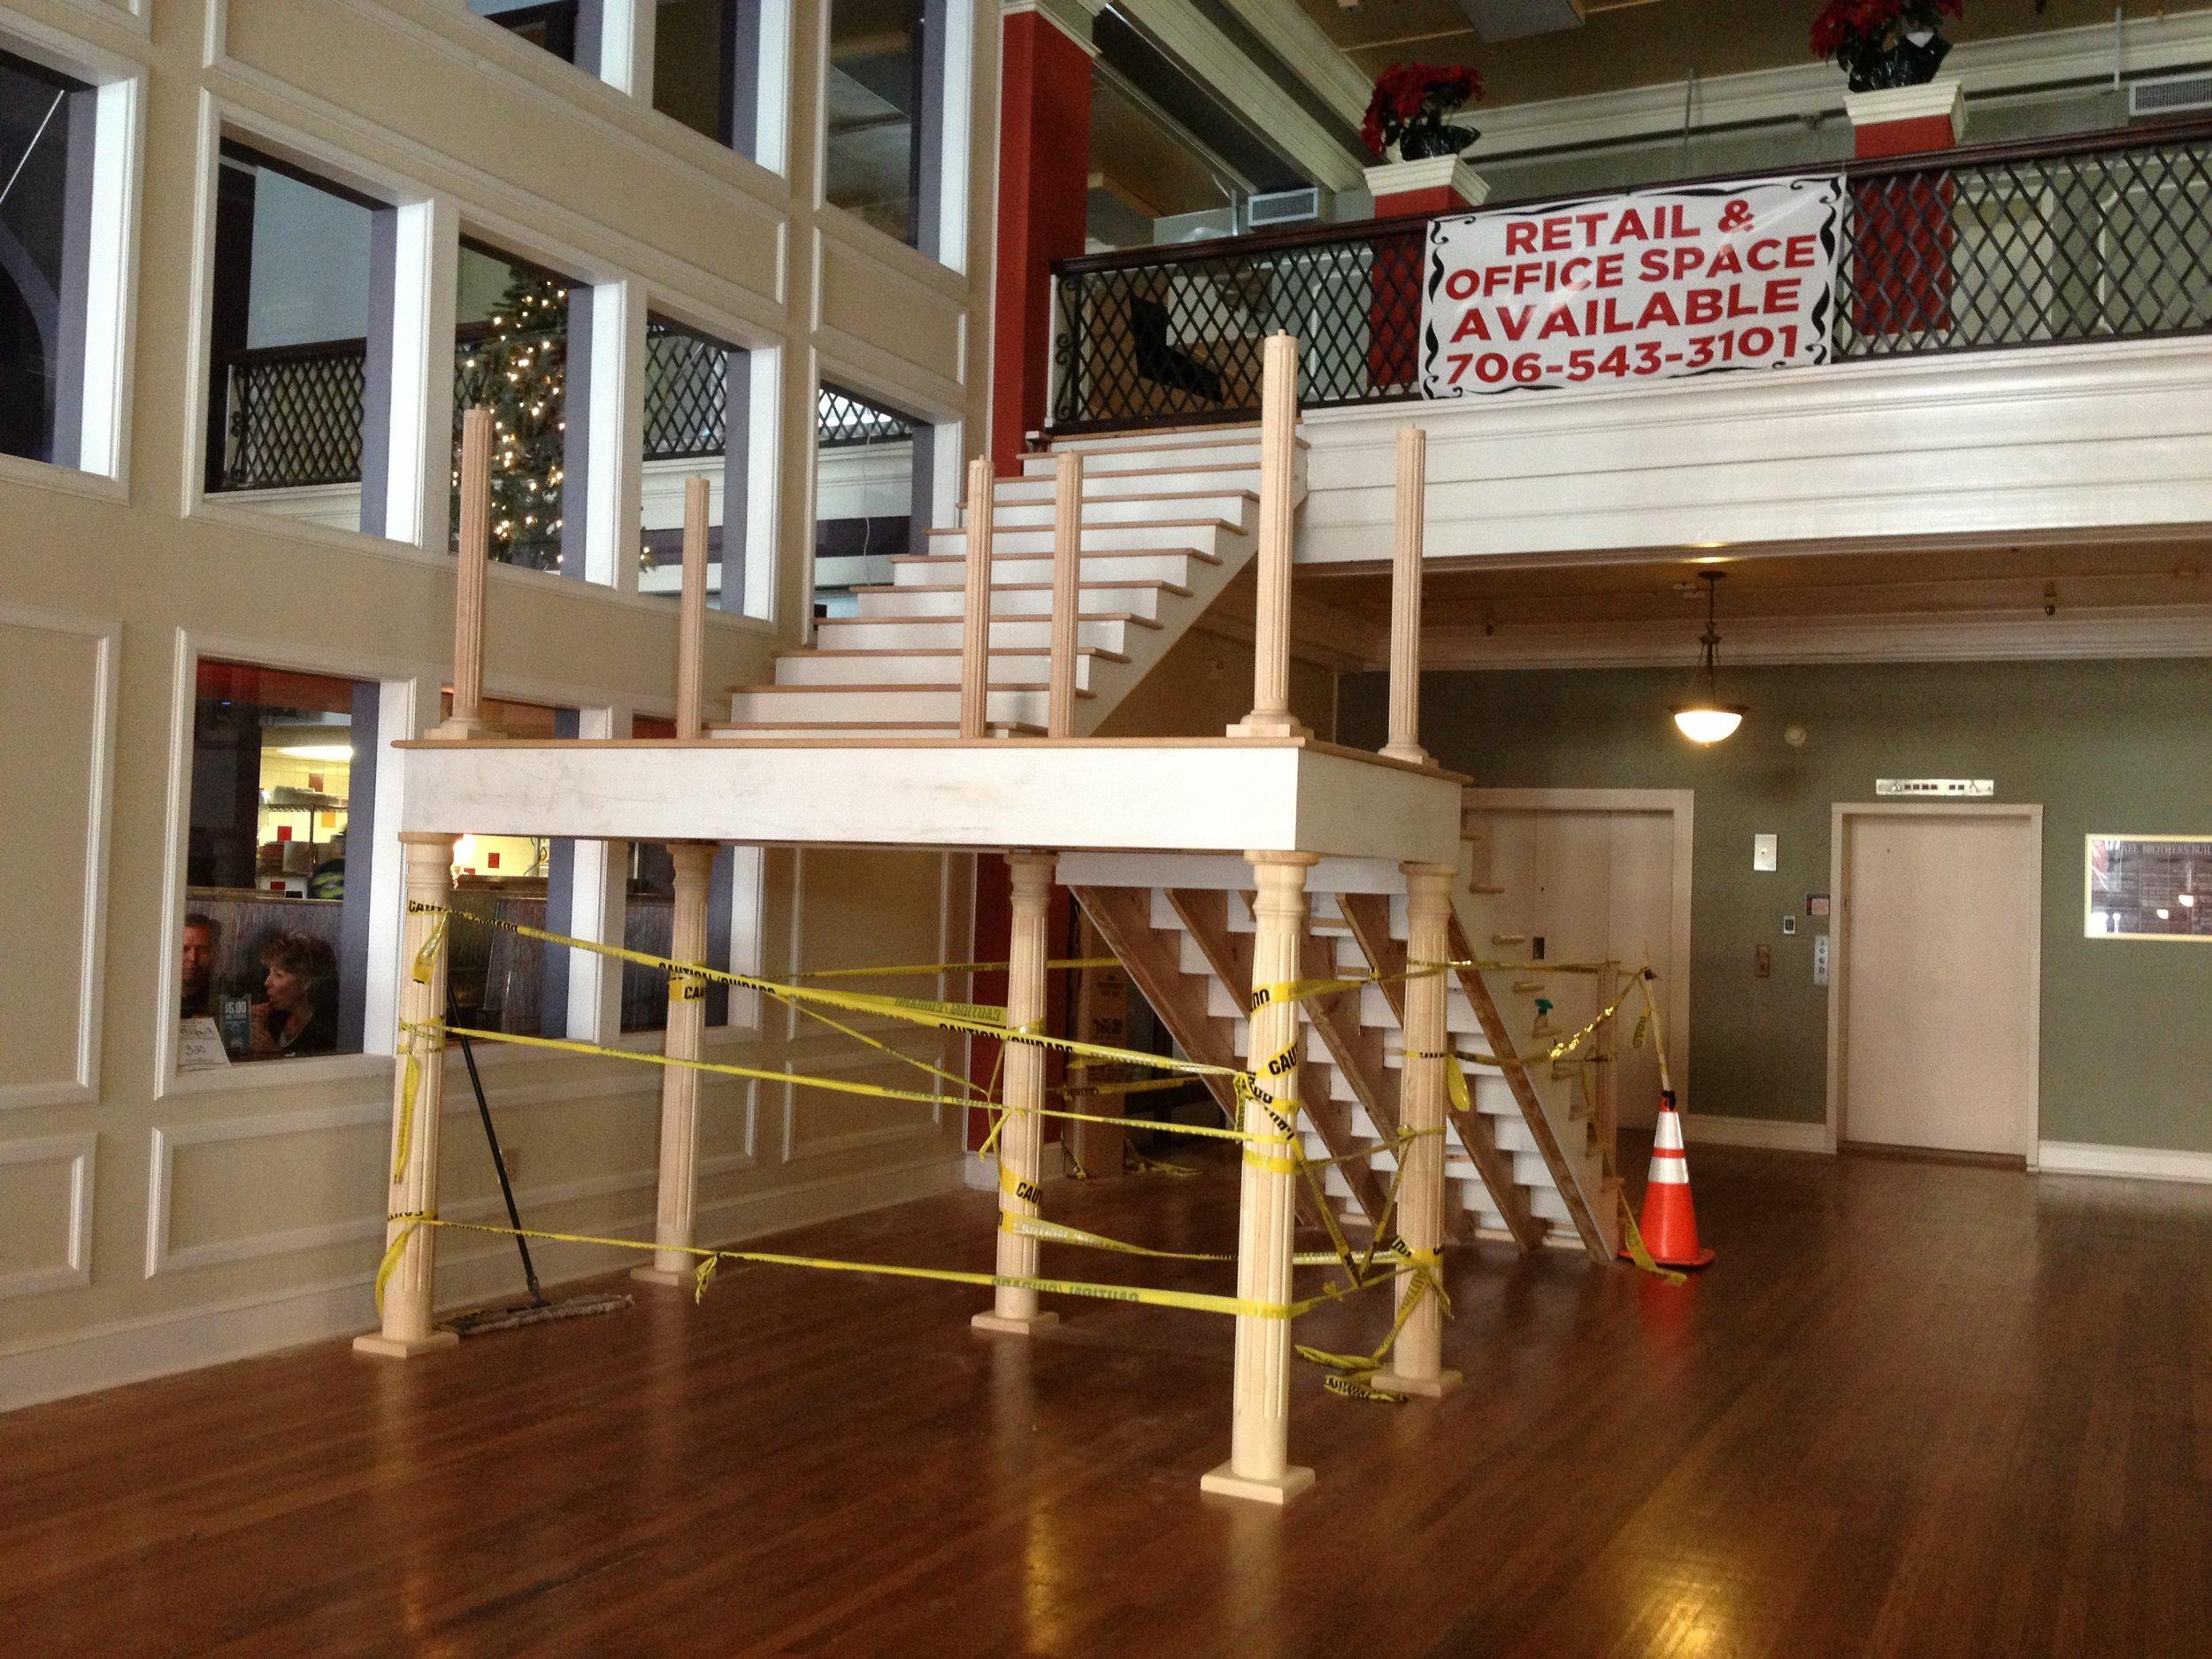 The Mezzanine Grand Lobby Staircase construction